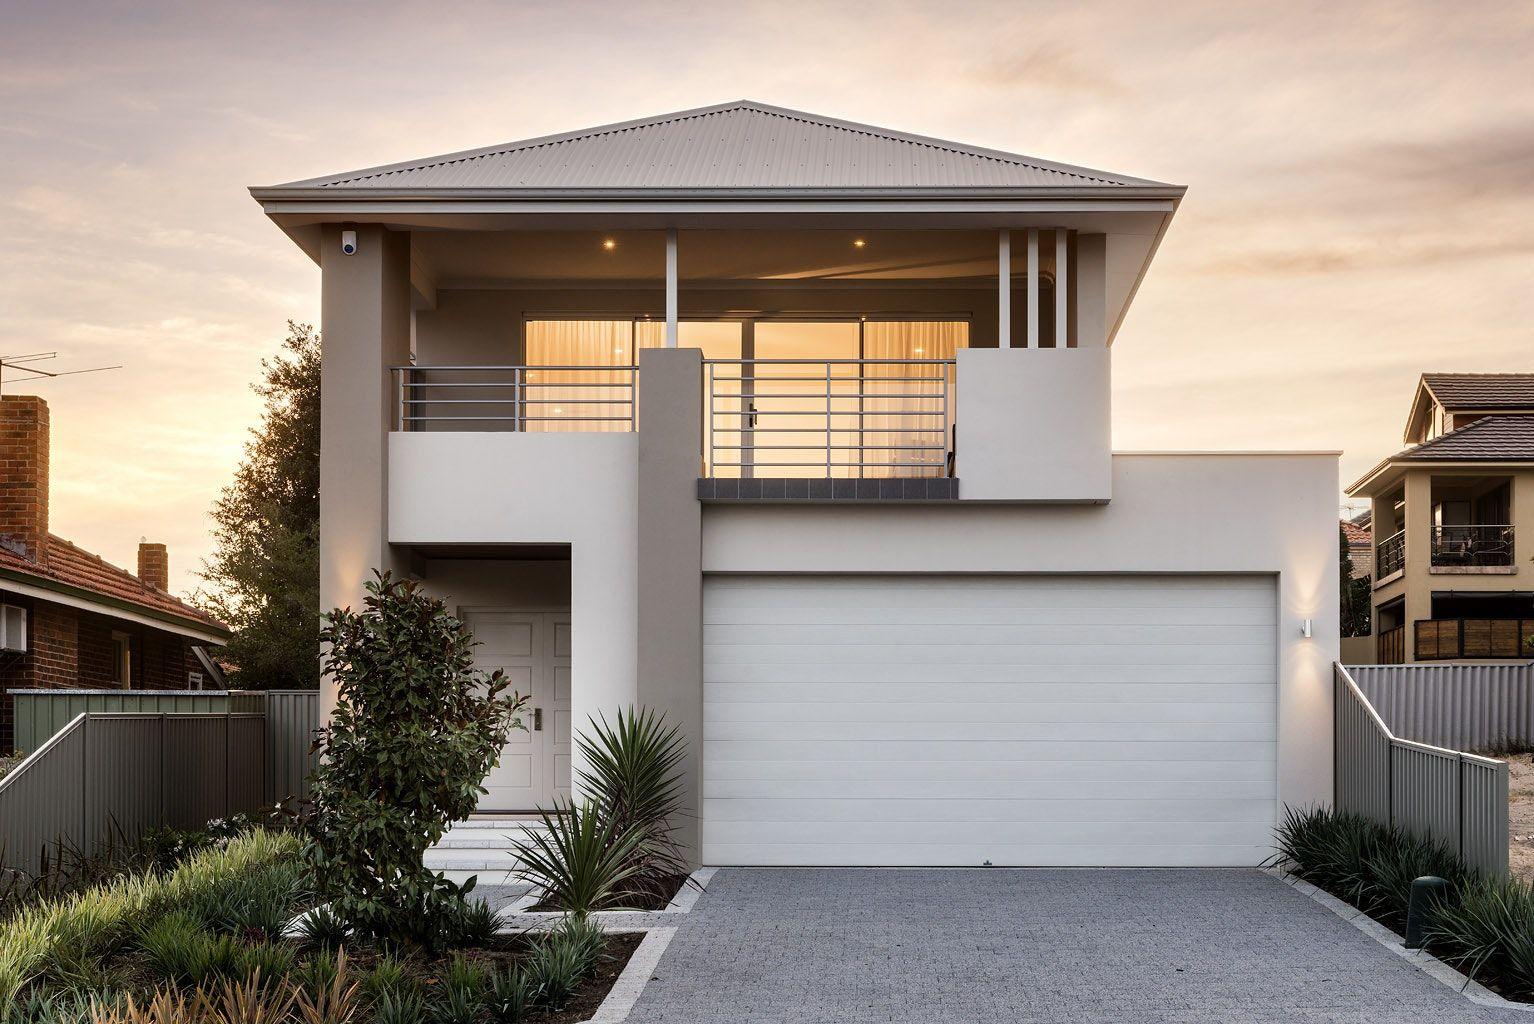 Small Block House Designs Brisbane Narrow Lot House Plans Building Plans House Narrow Lot House